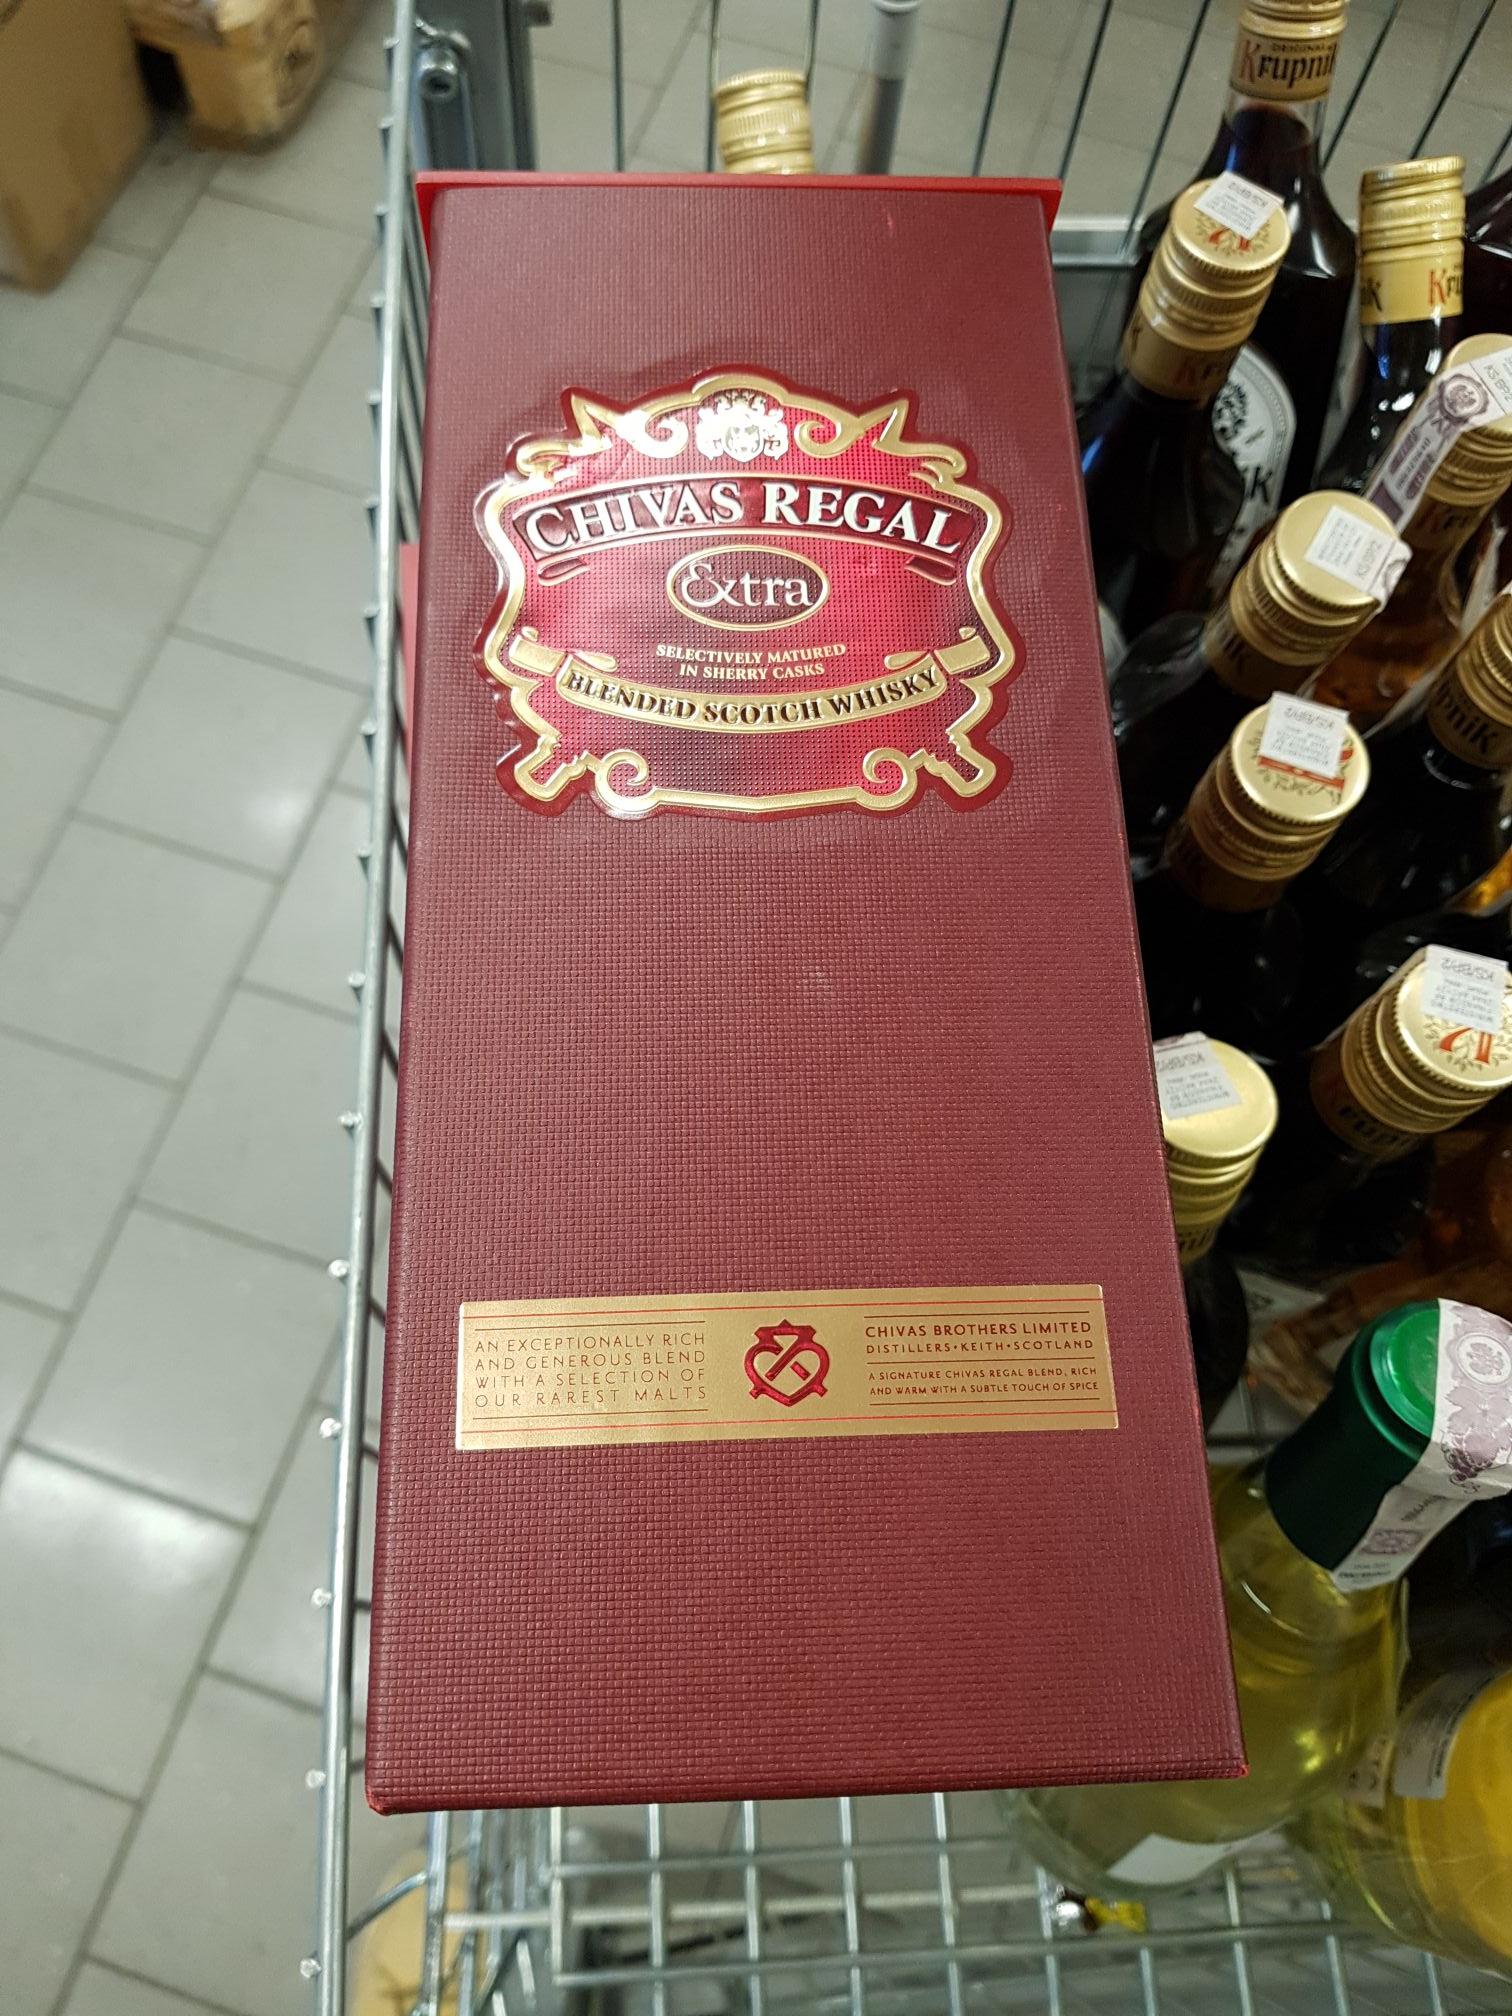 Whisky Chivas Regal Extra 0.7L @Netto